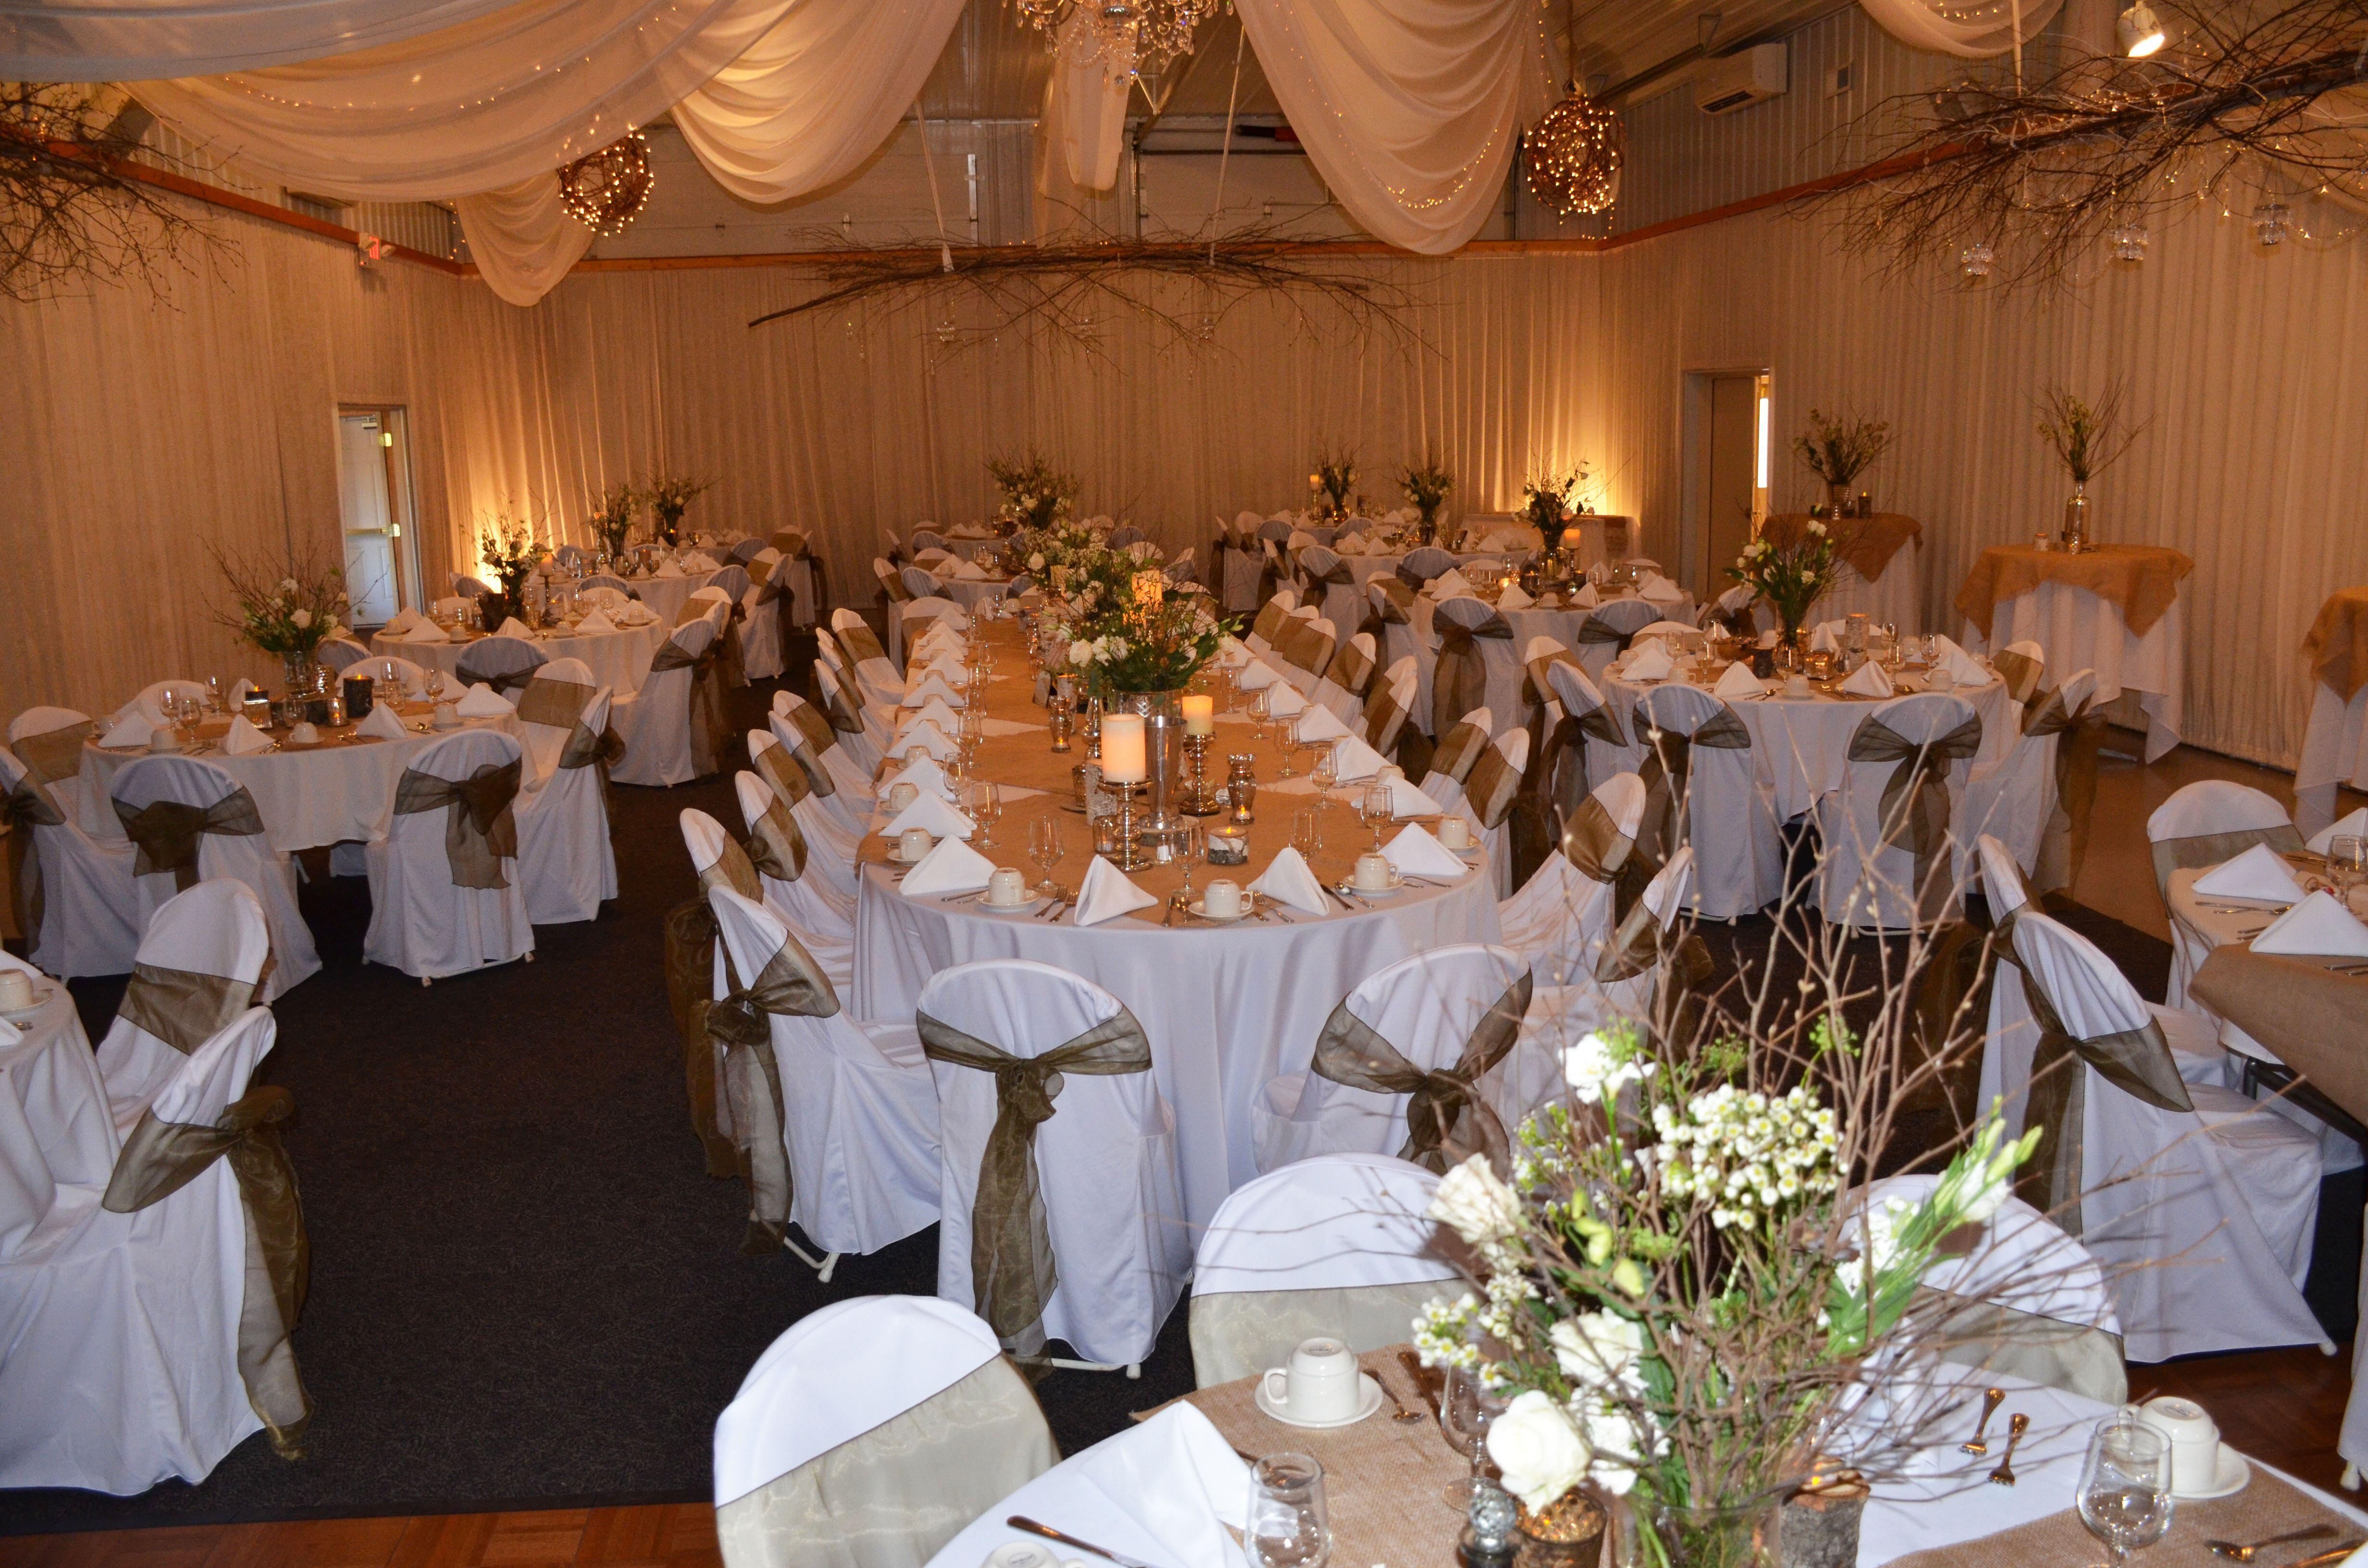 Reception Hall At Pine Peaks Wedding Event Center Event Center Reception Hall Wedding Events